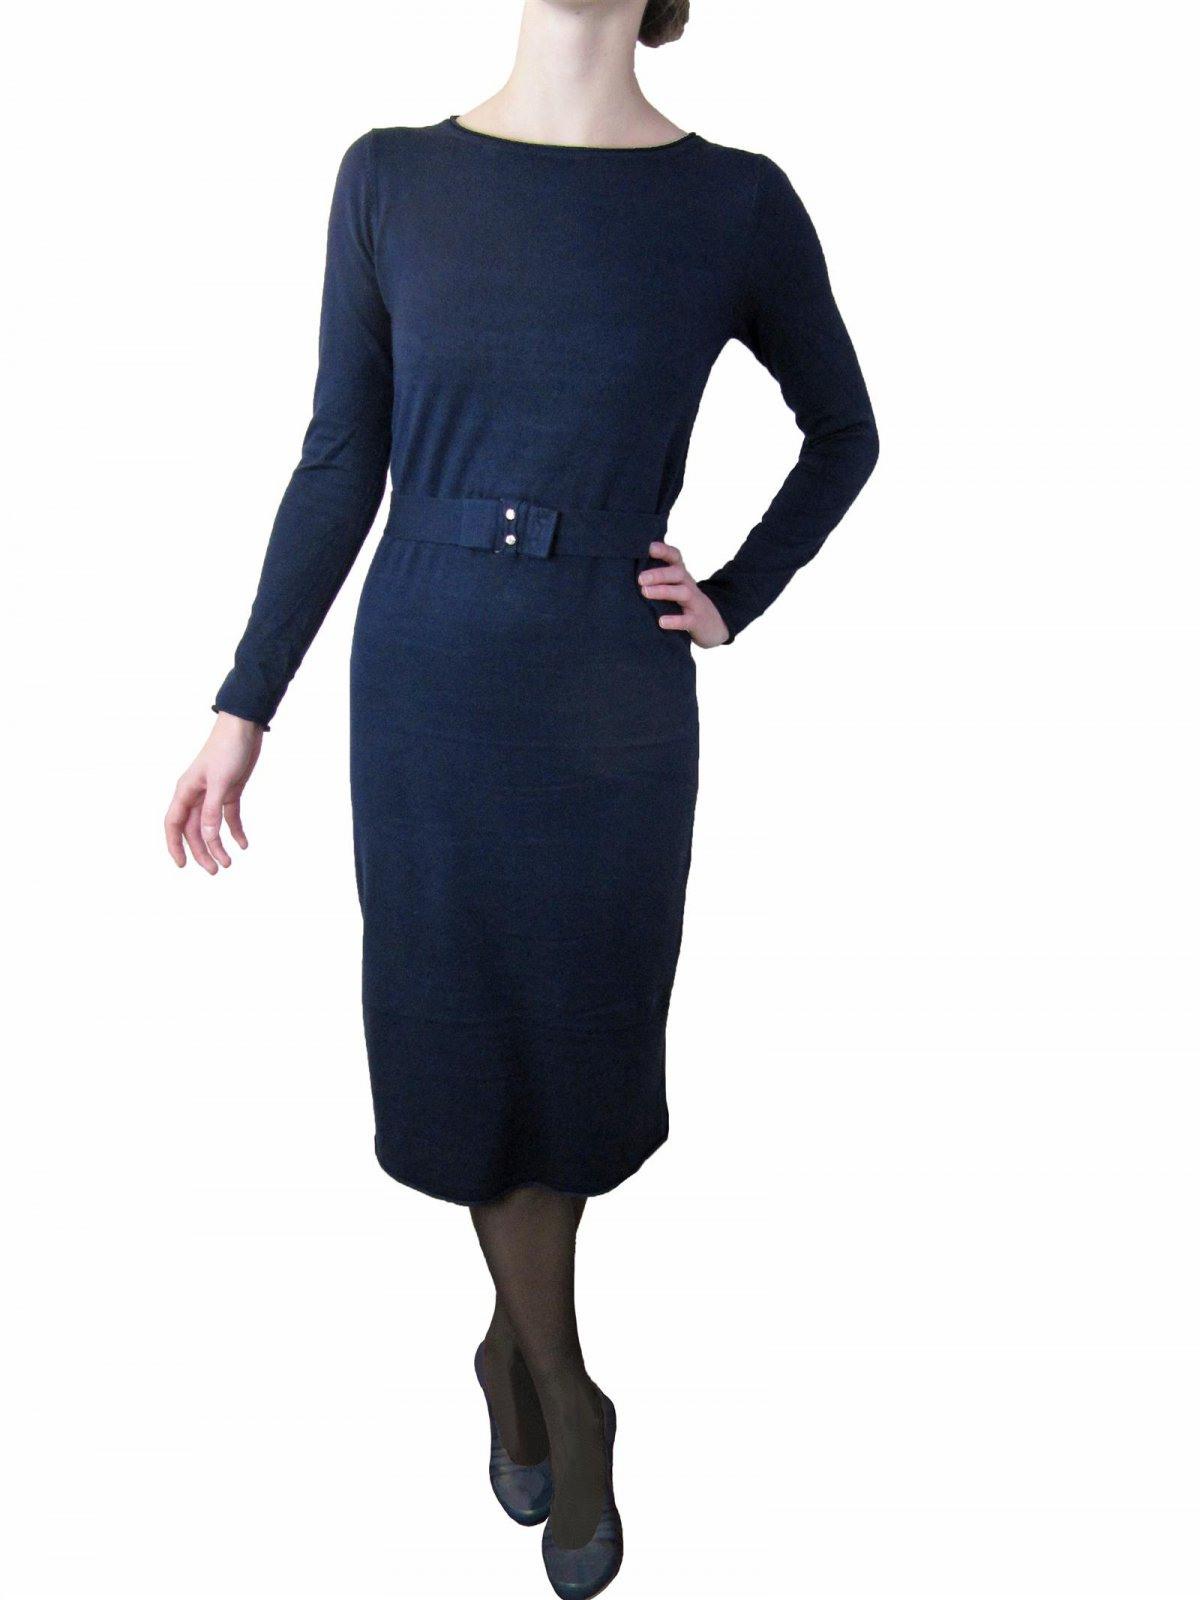 Langes Midi Strickkleid Kleid Tunika Gürtel Strass